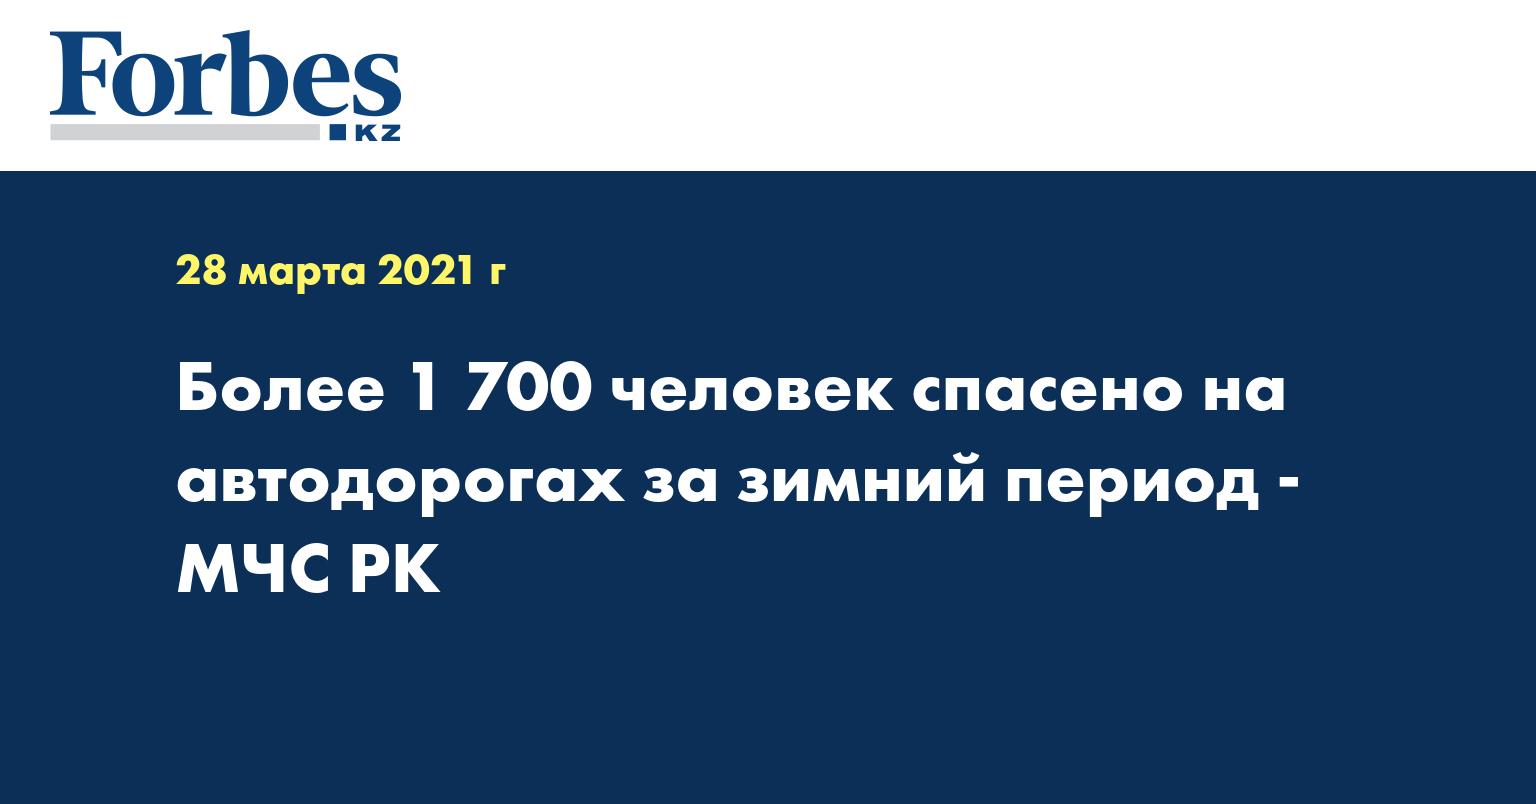 Более 1 700 человек спасено на автодорогах за зимний период - МЧС РК